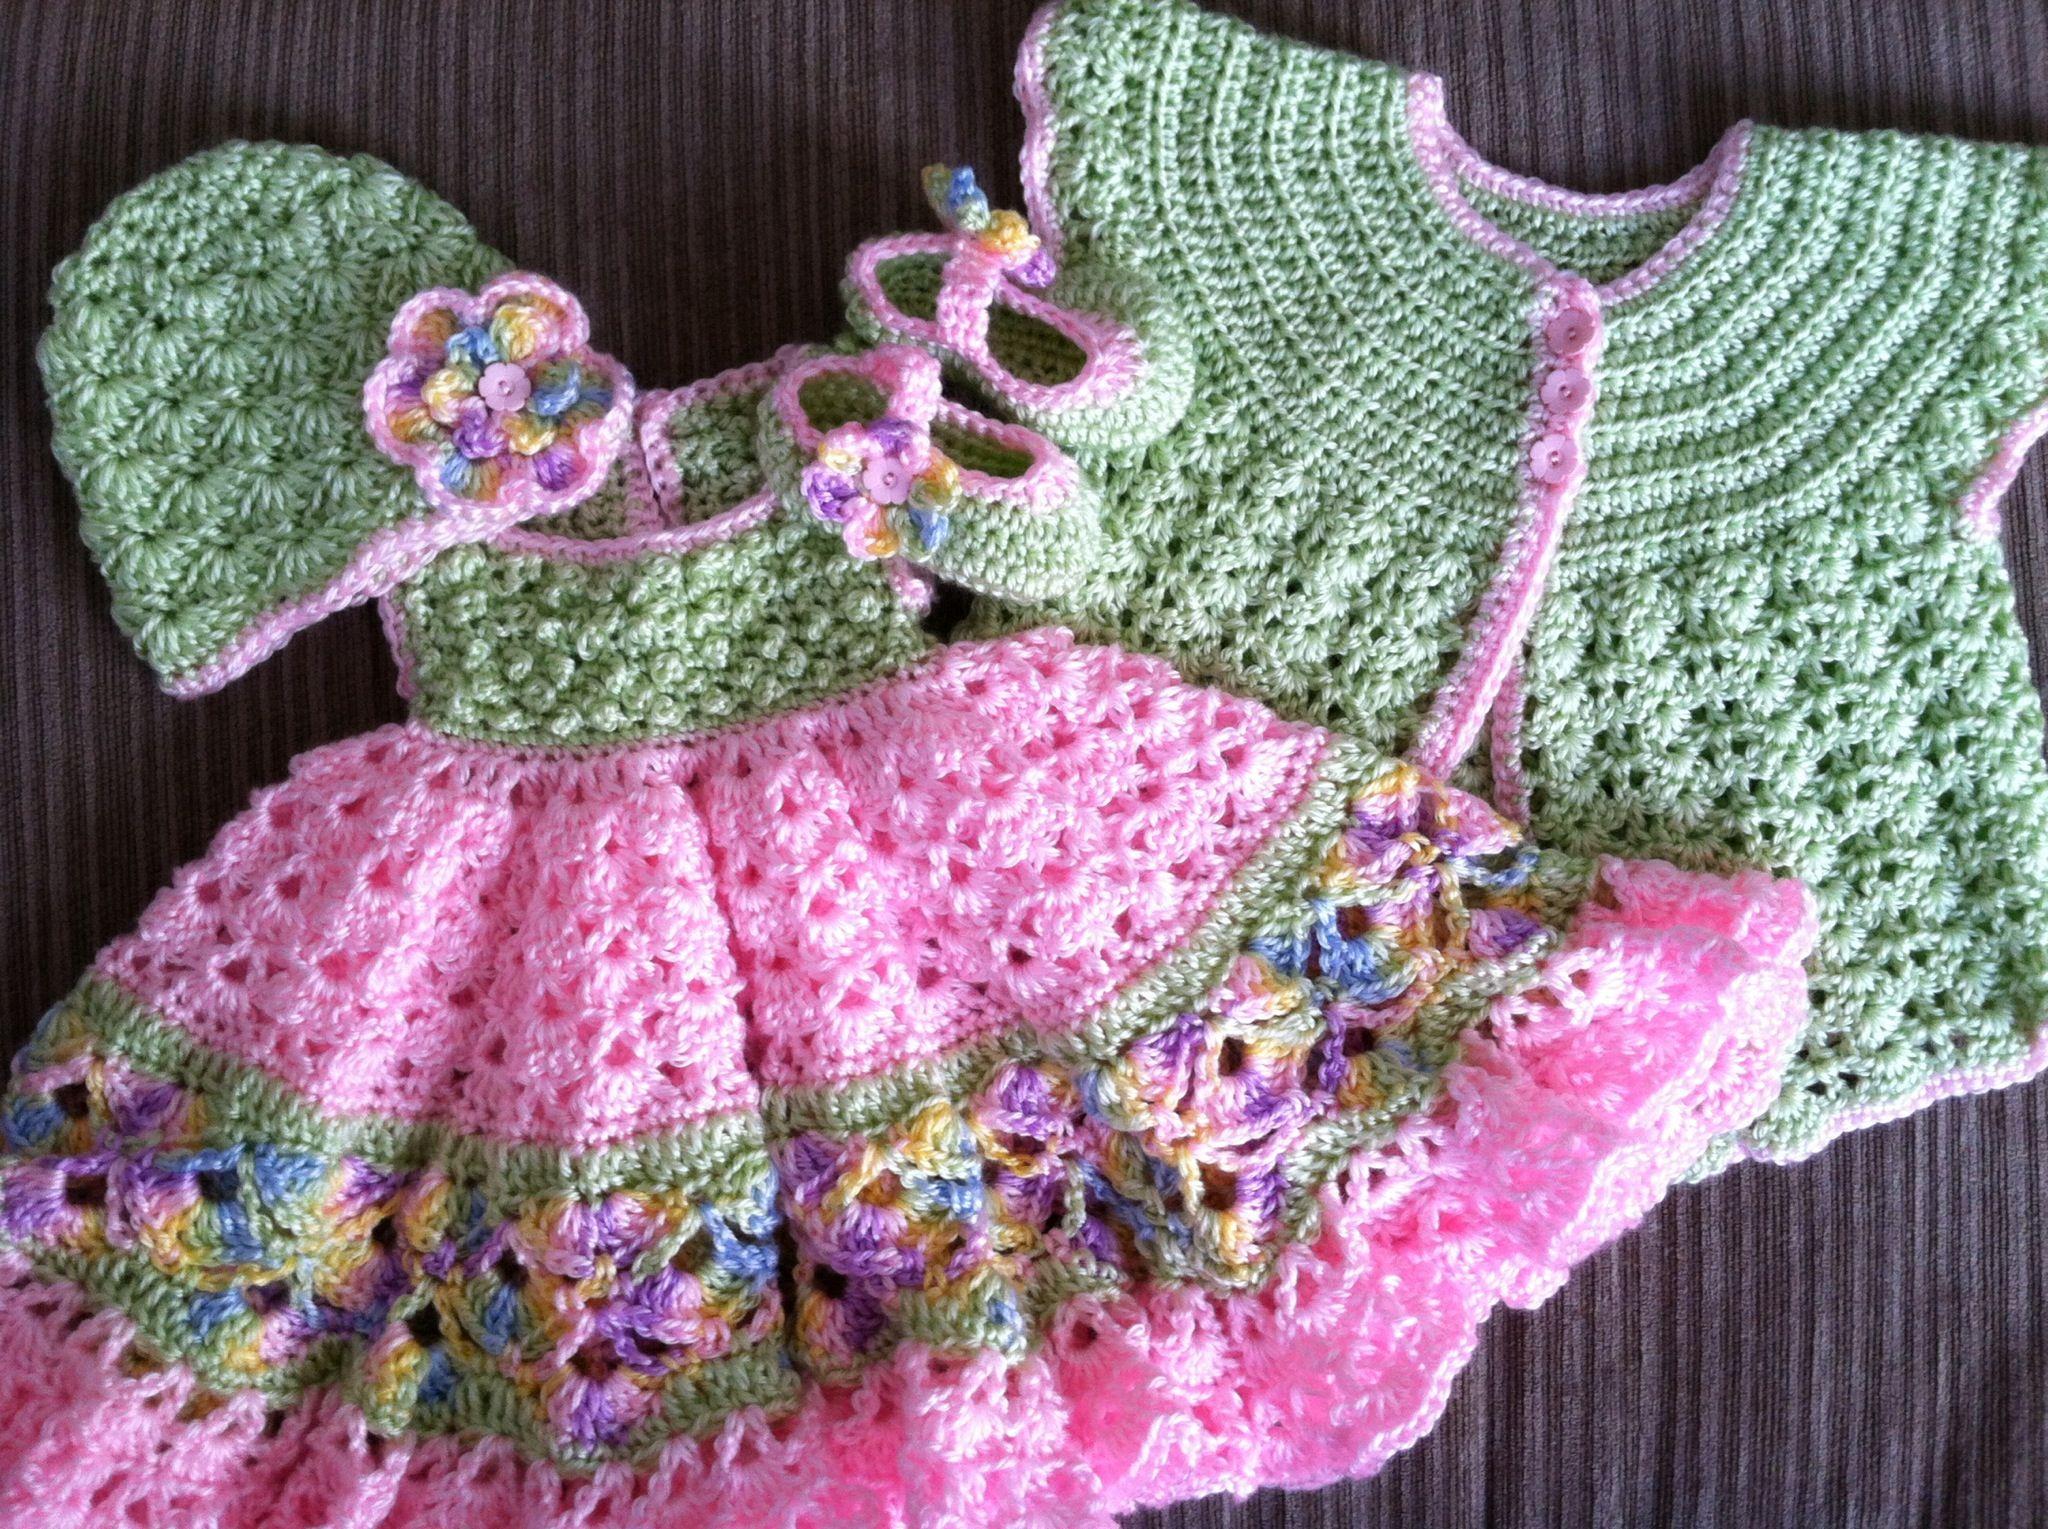 4 piece baby girl crochet set #jazzycraftycreations @ Etsy.com | My ...